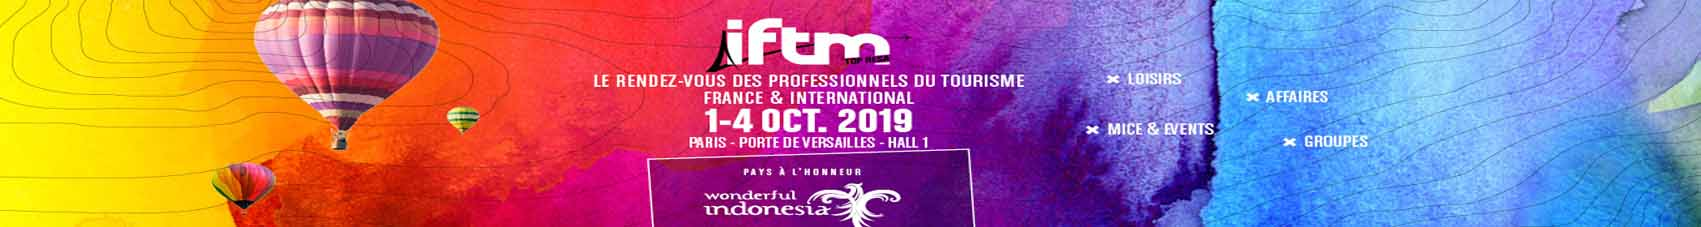 IFTM Top resa, IFTMTOP RESA, IFTM